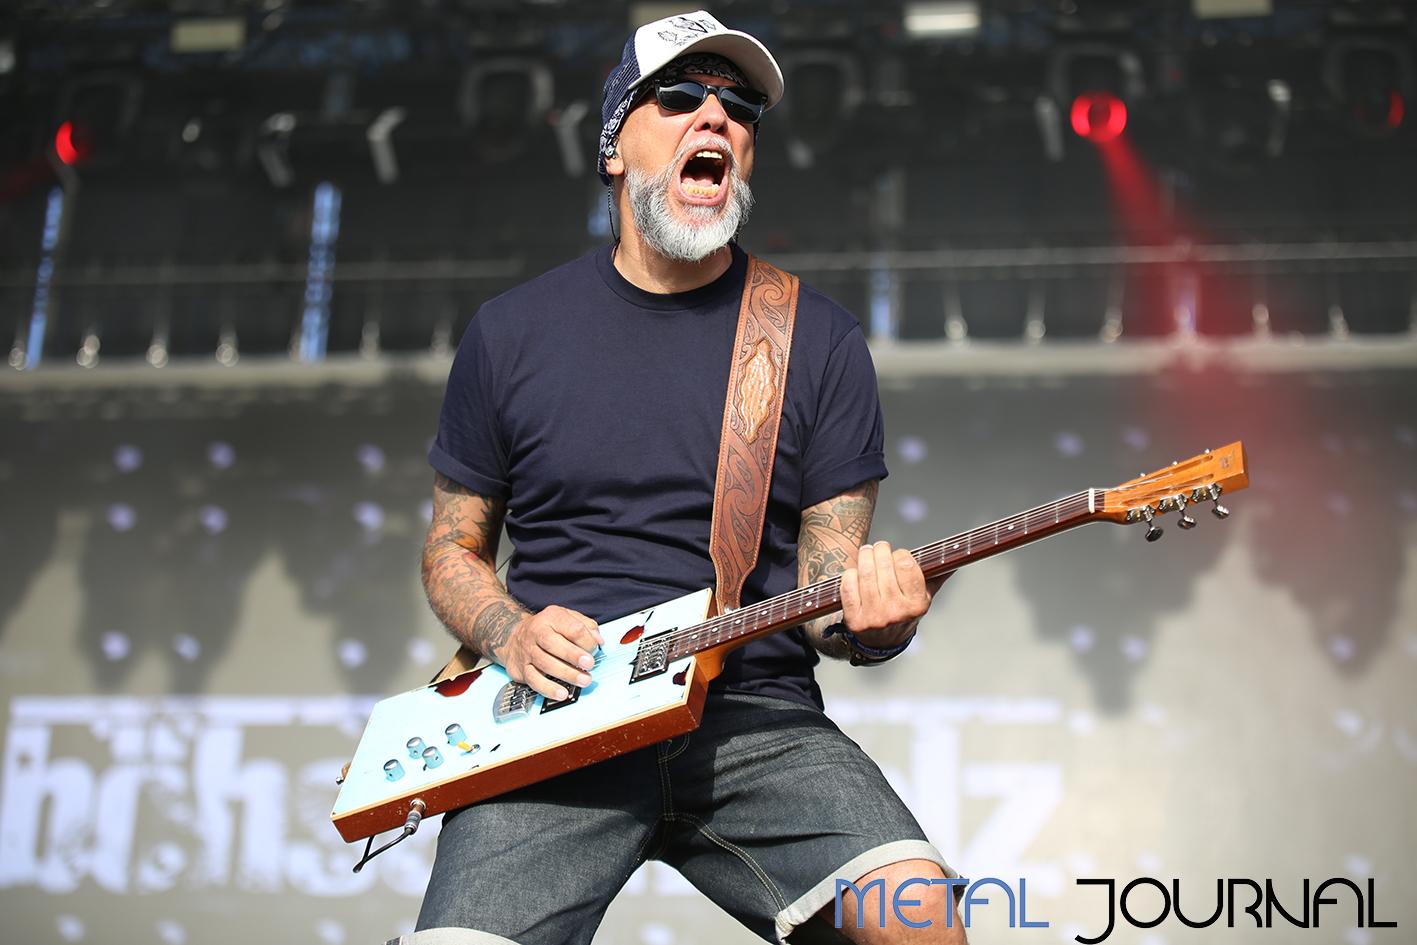 bohse onkelz - metal journal rock fest barcelona 2019 pic 2